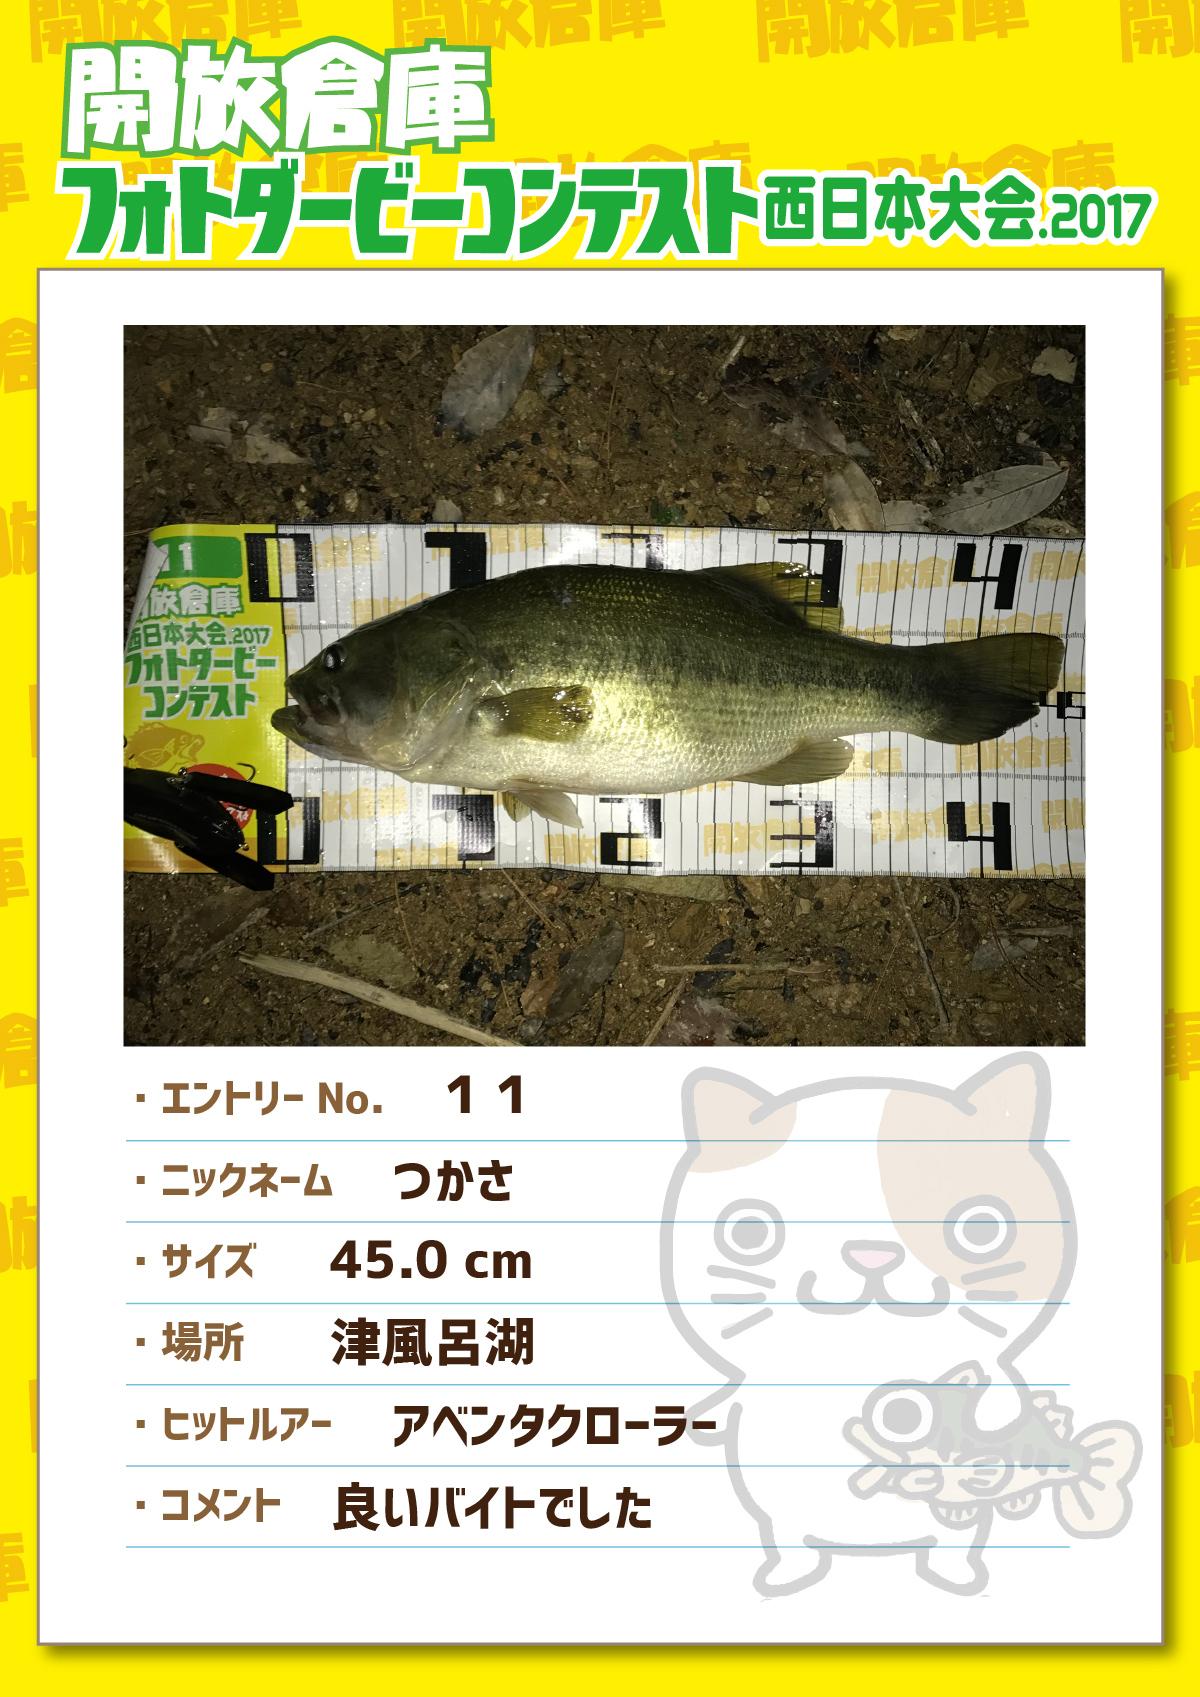 No.011 ちゃちゃ 45.0cm 津風呂湖 アベンタクローラー 良いバイトでした